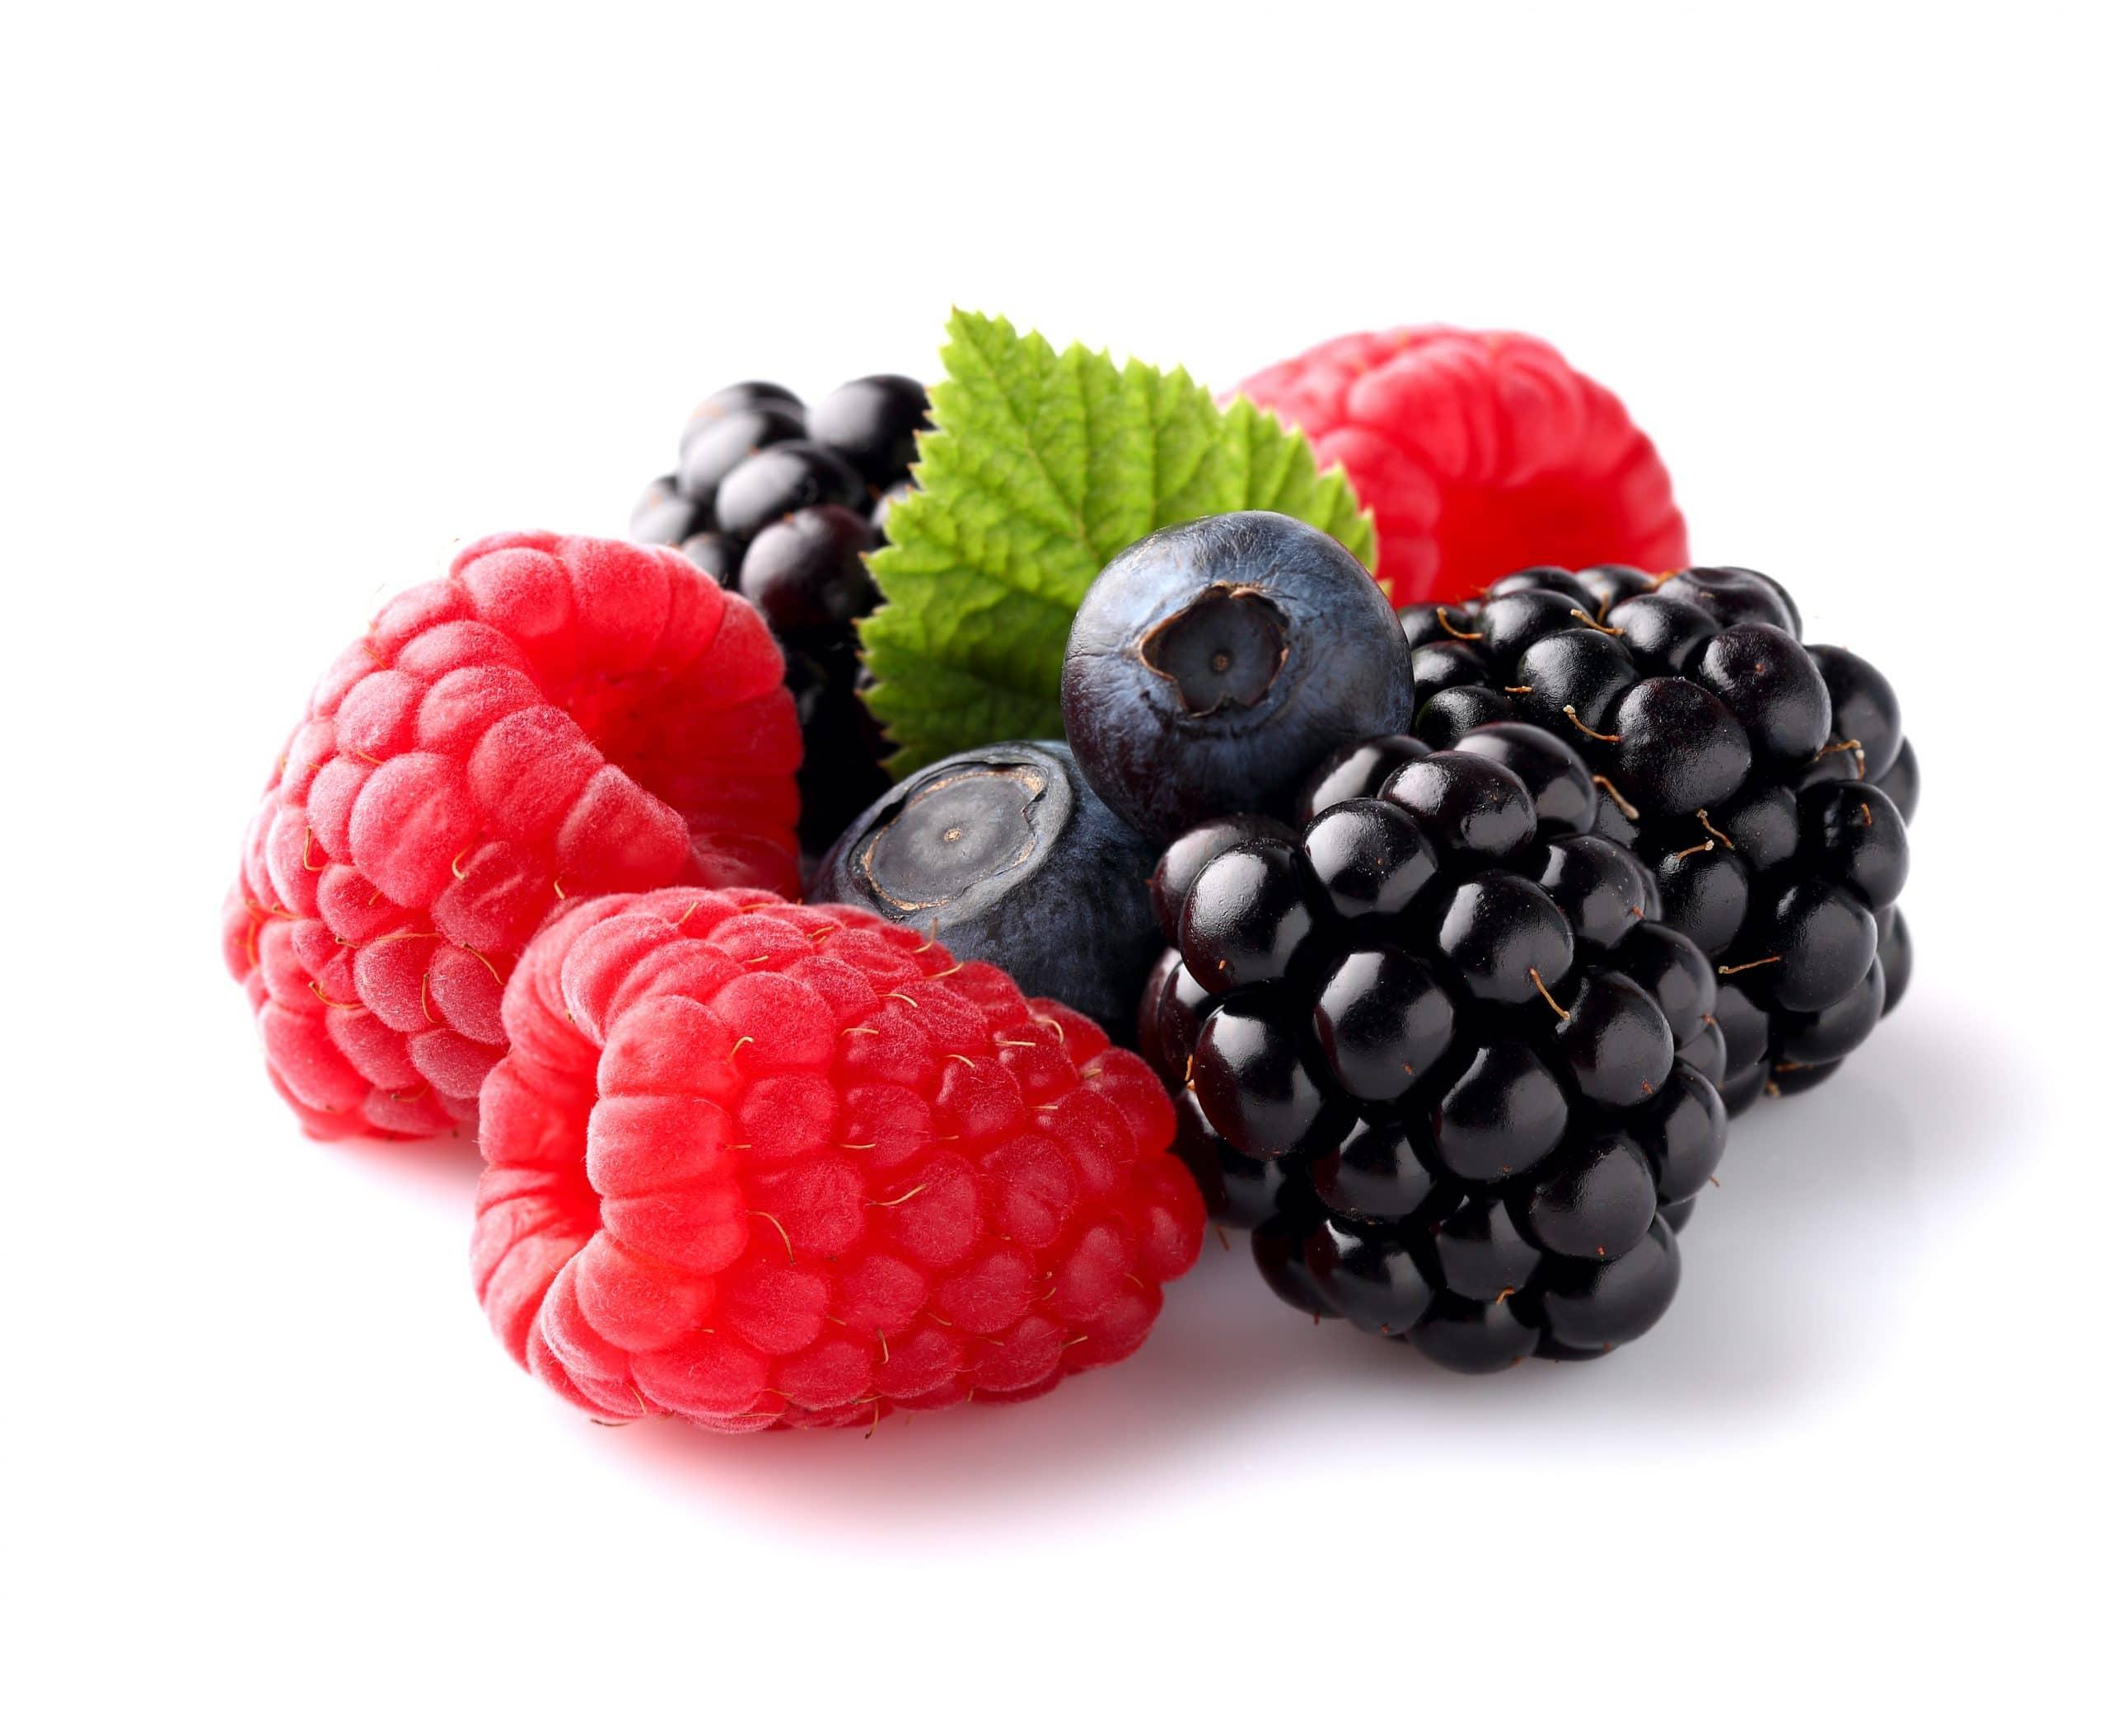 assorted ripe berries